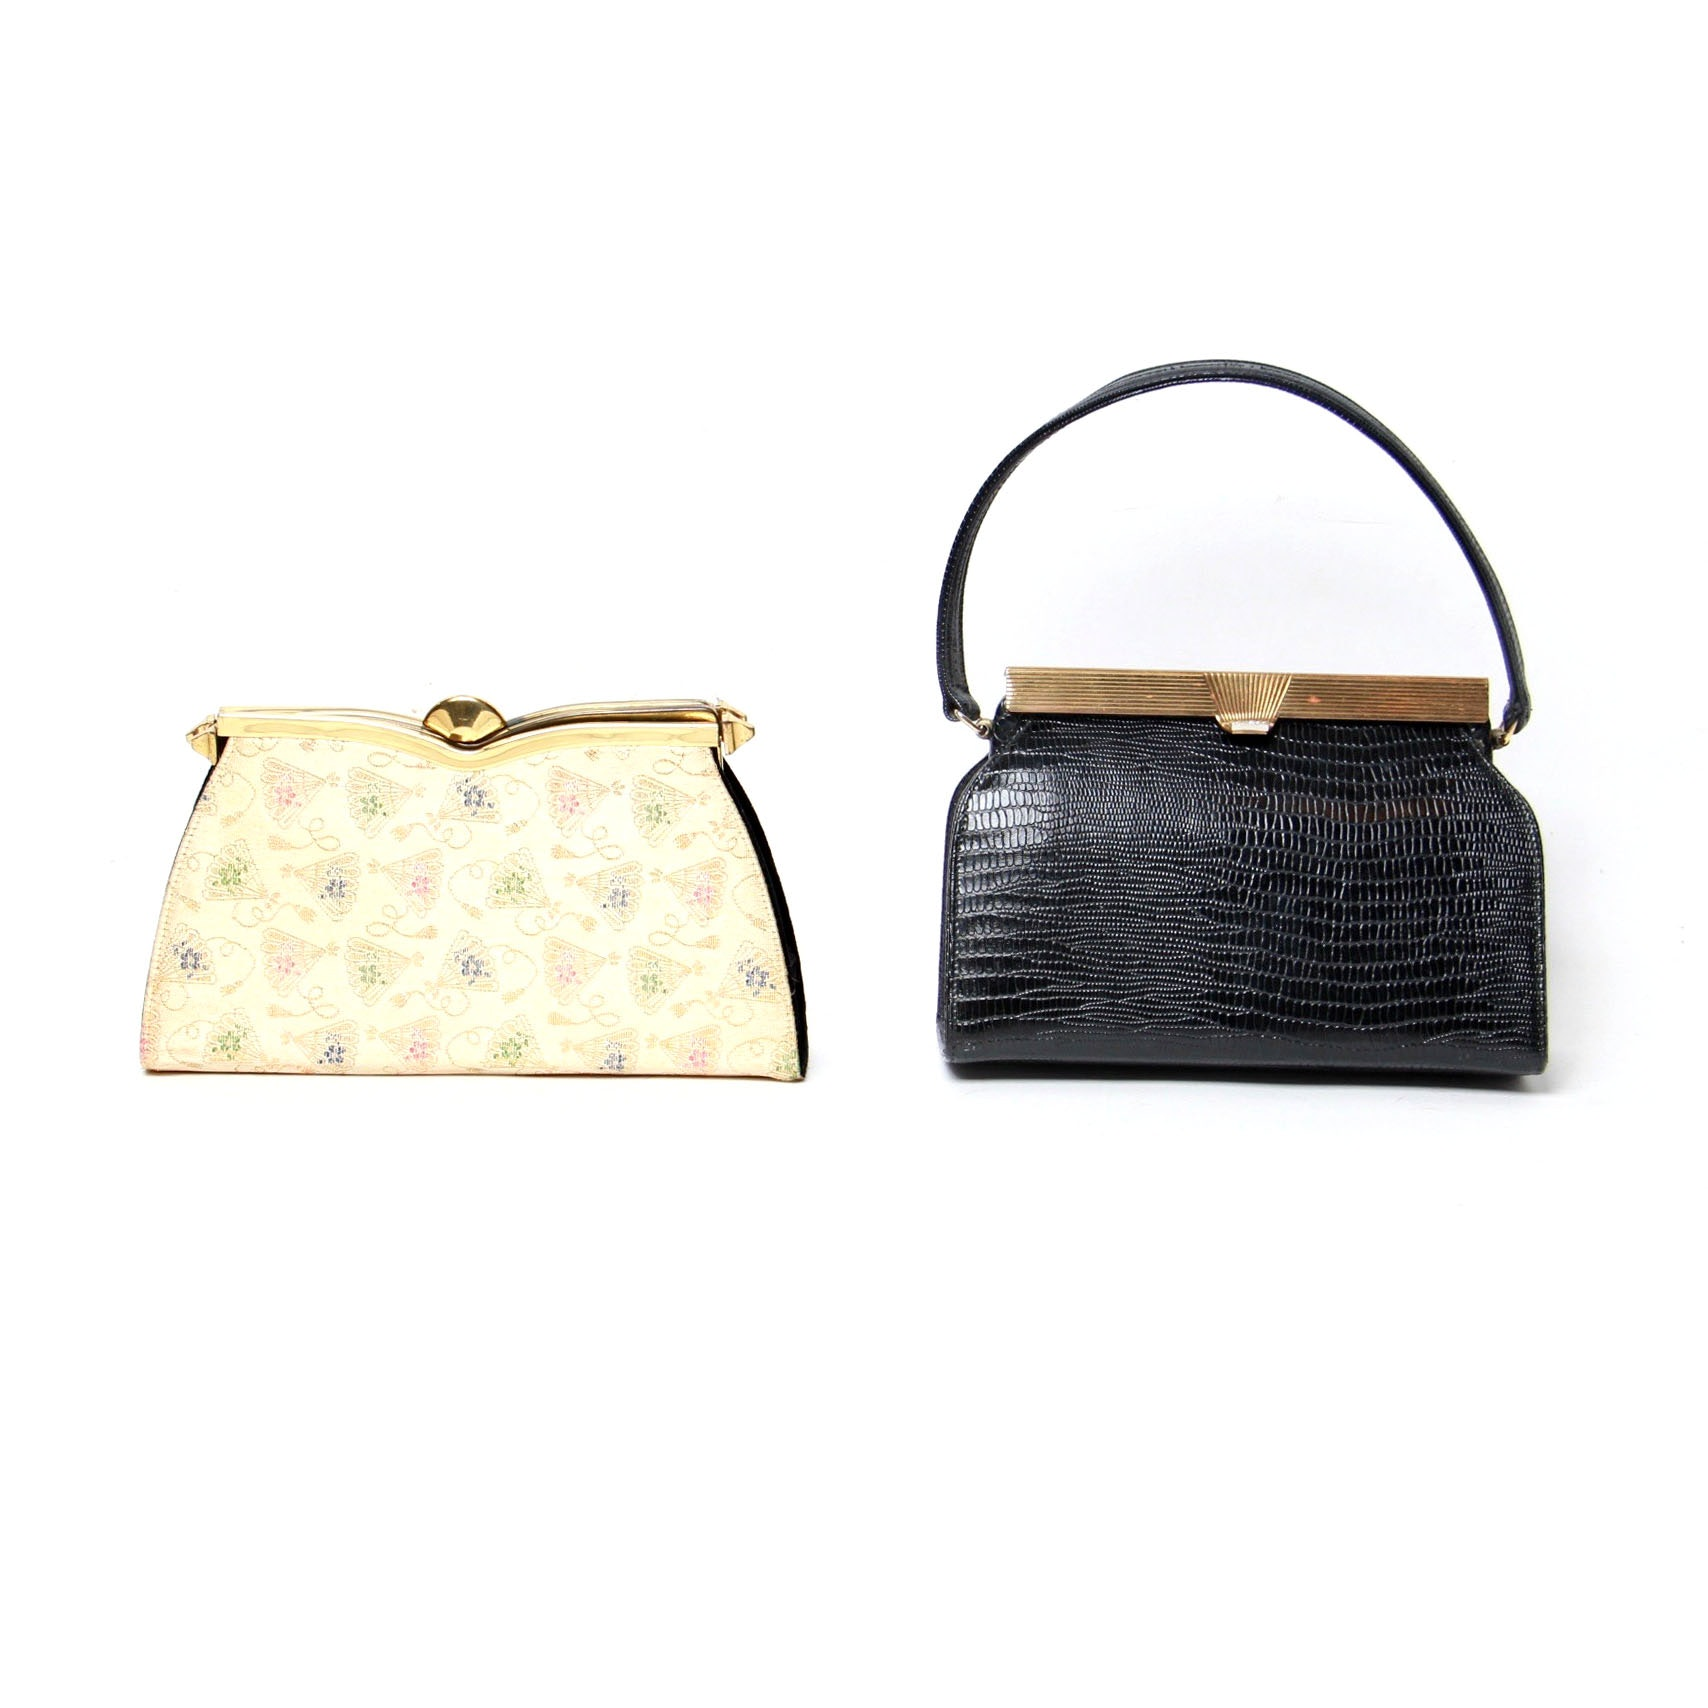 Vintage Handbags Including Meyers